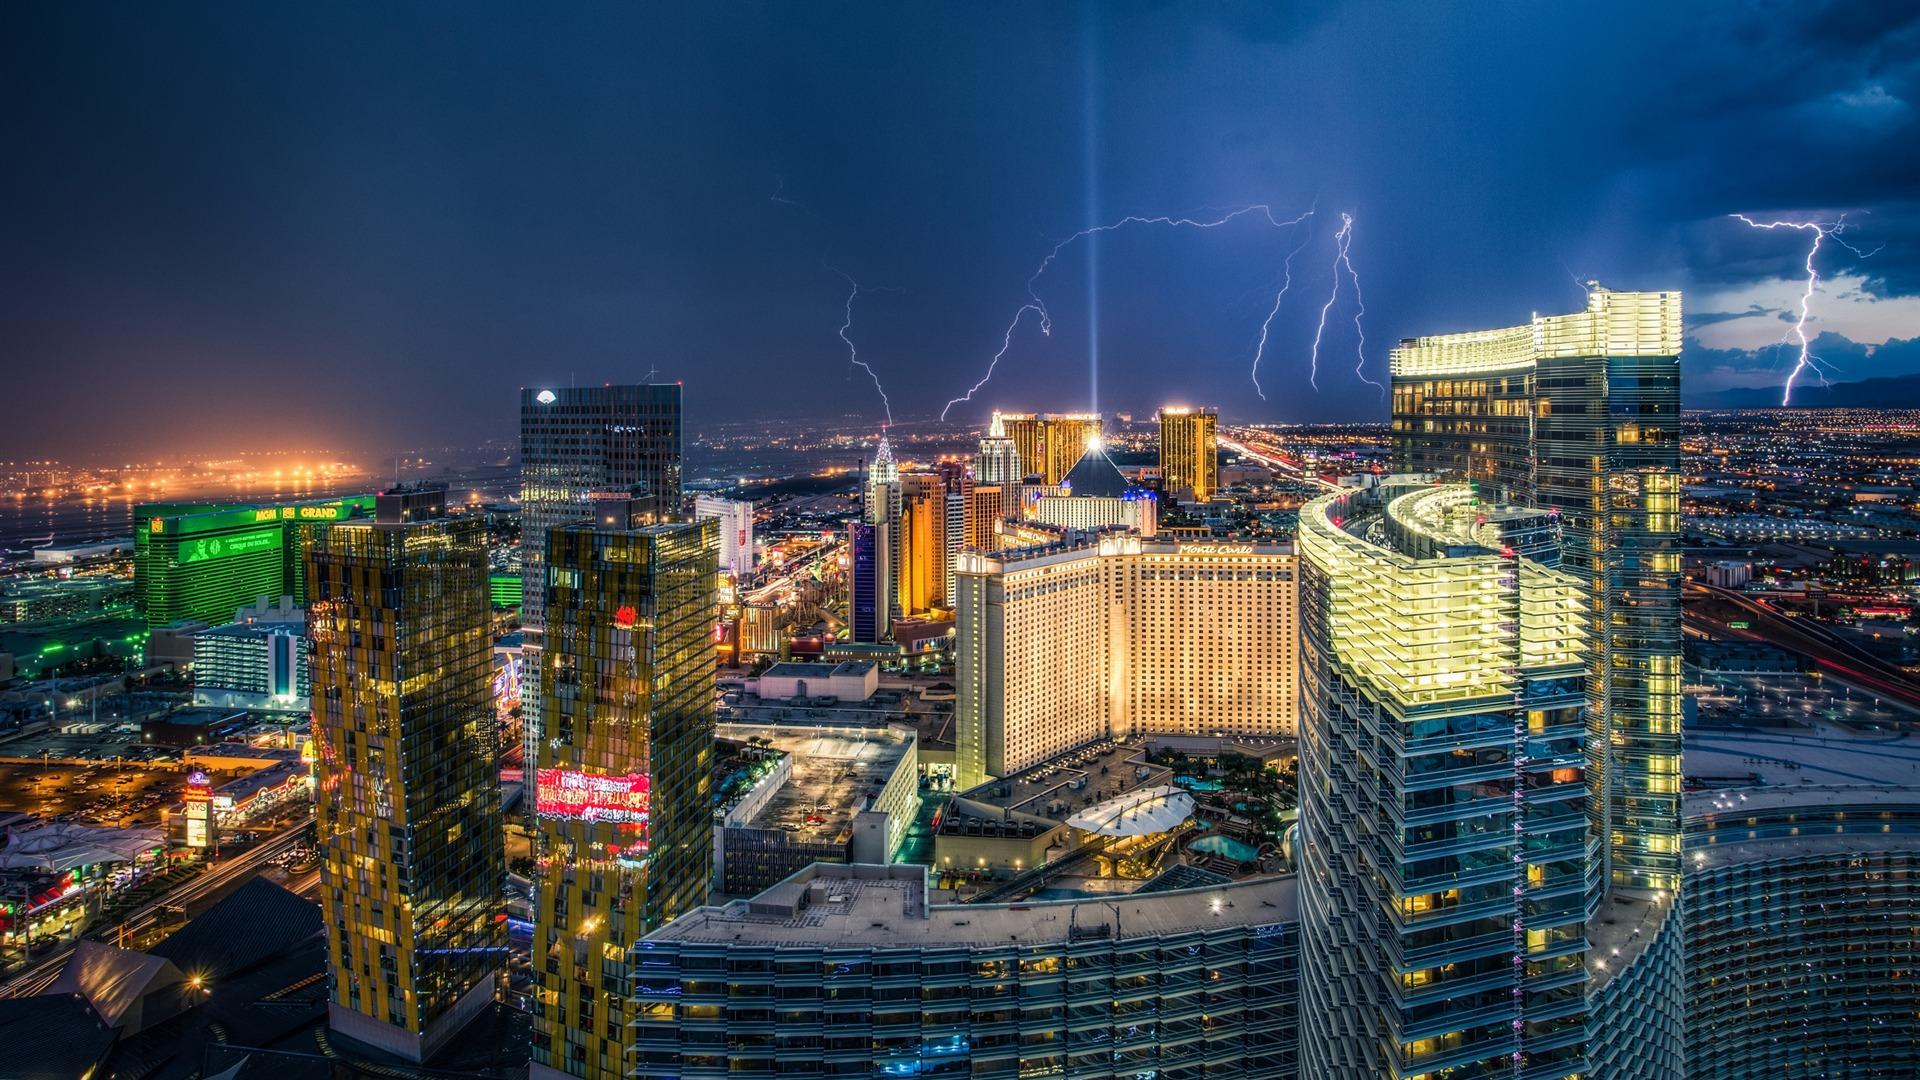 Las Vegas Lightnings Cities Hd Wallpaper Preview 10wallpaper Com